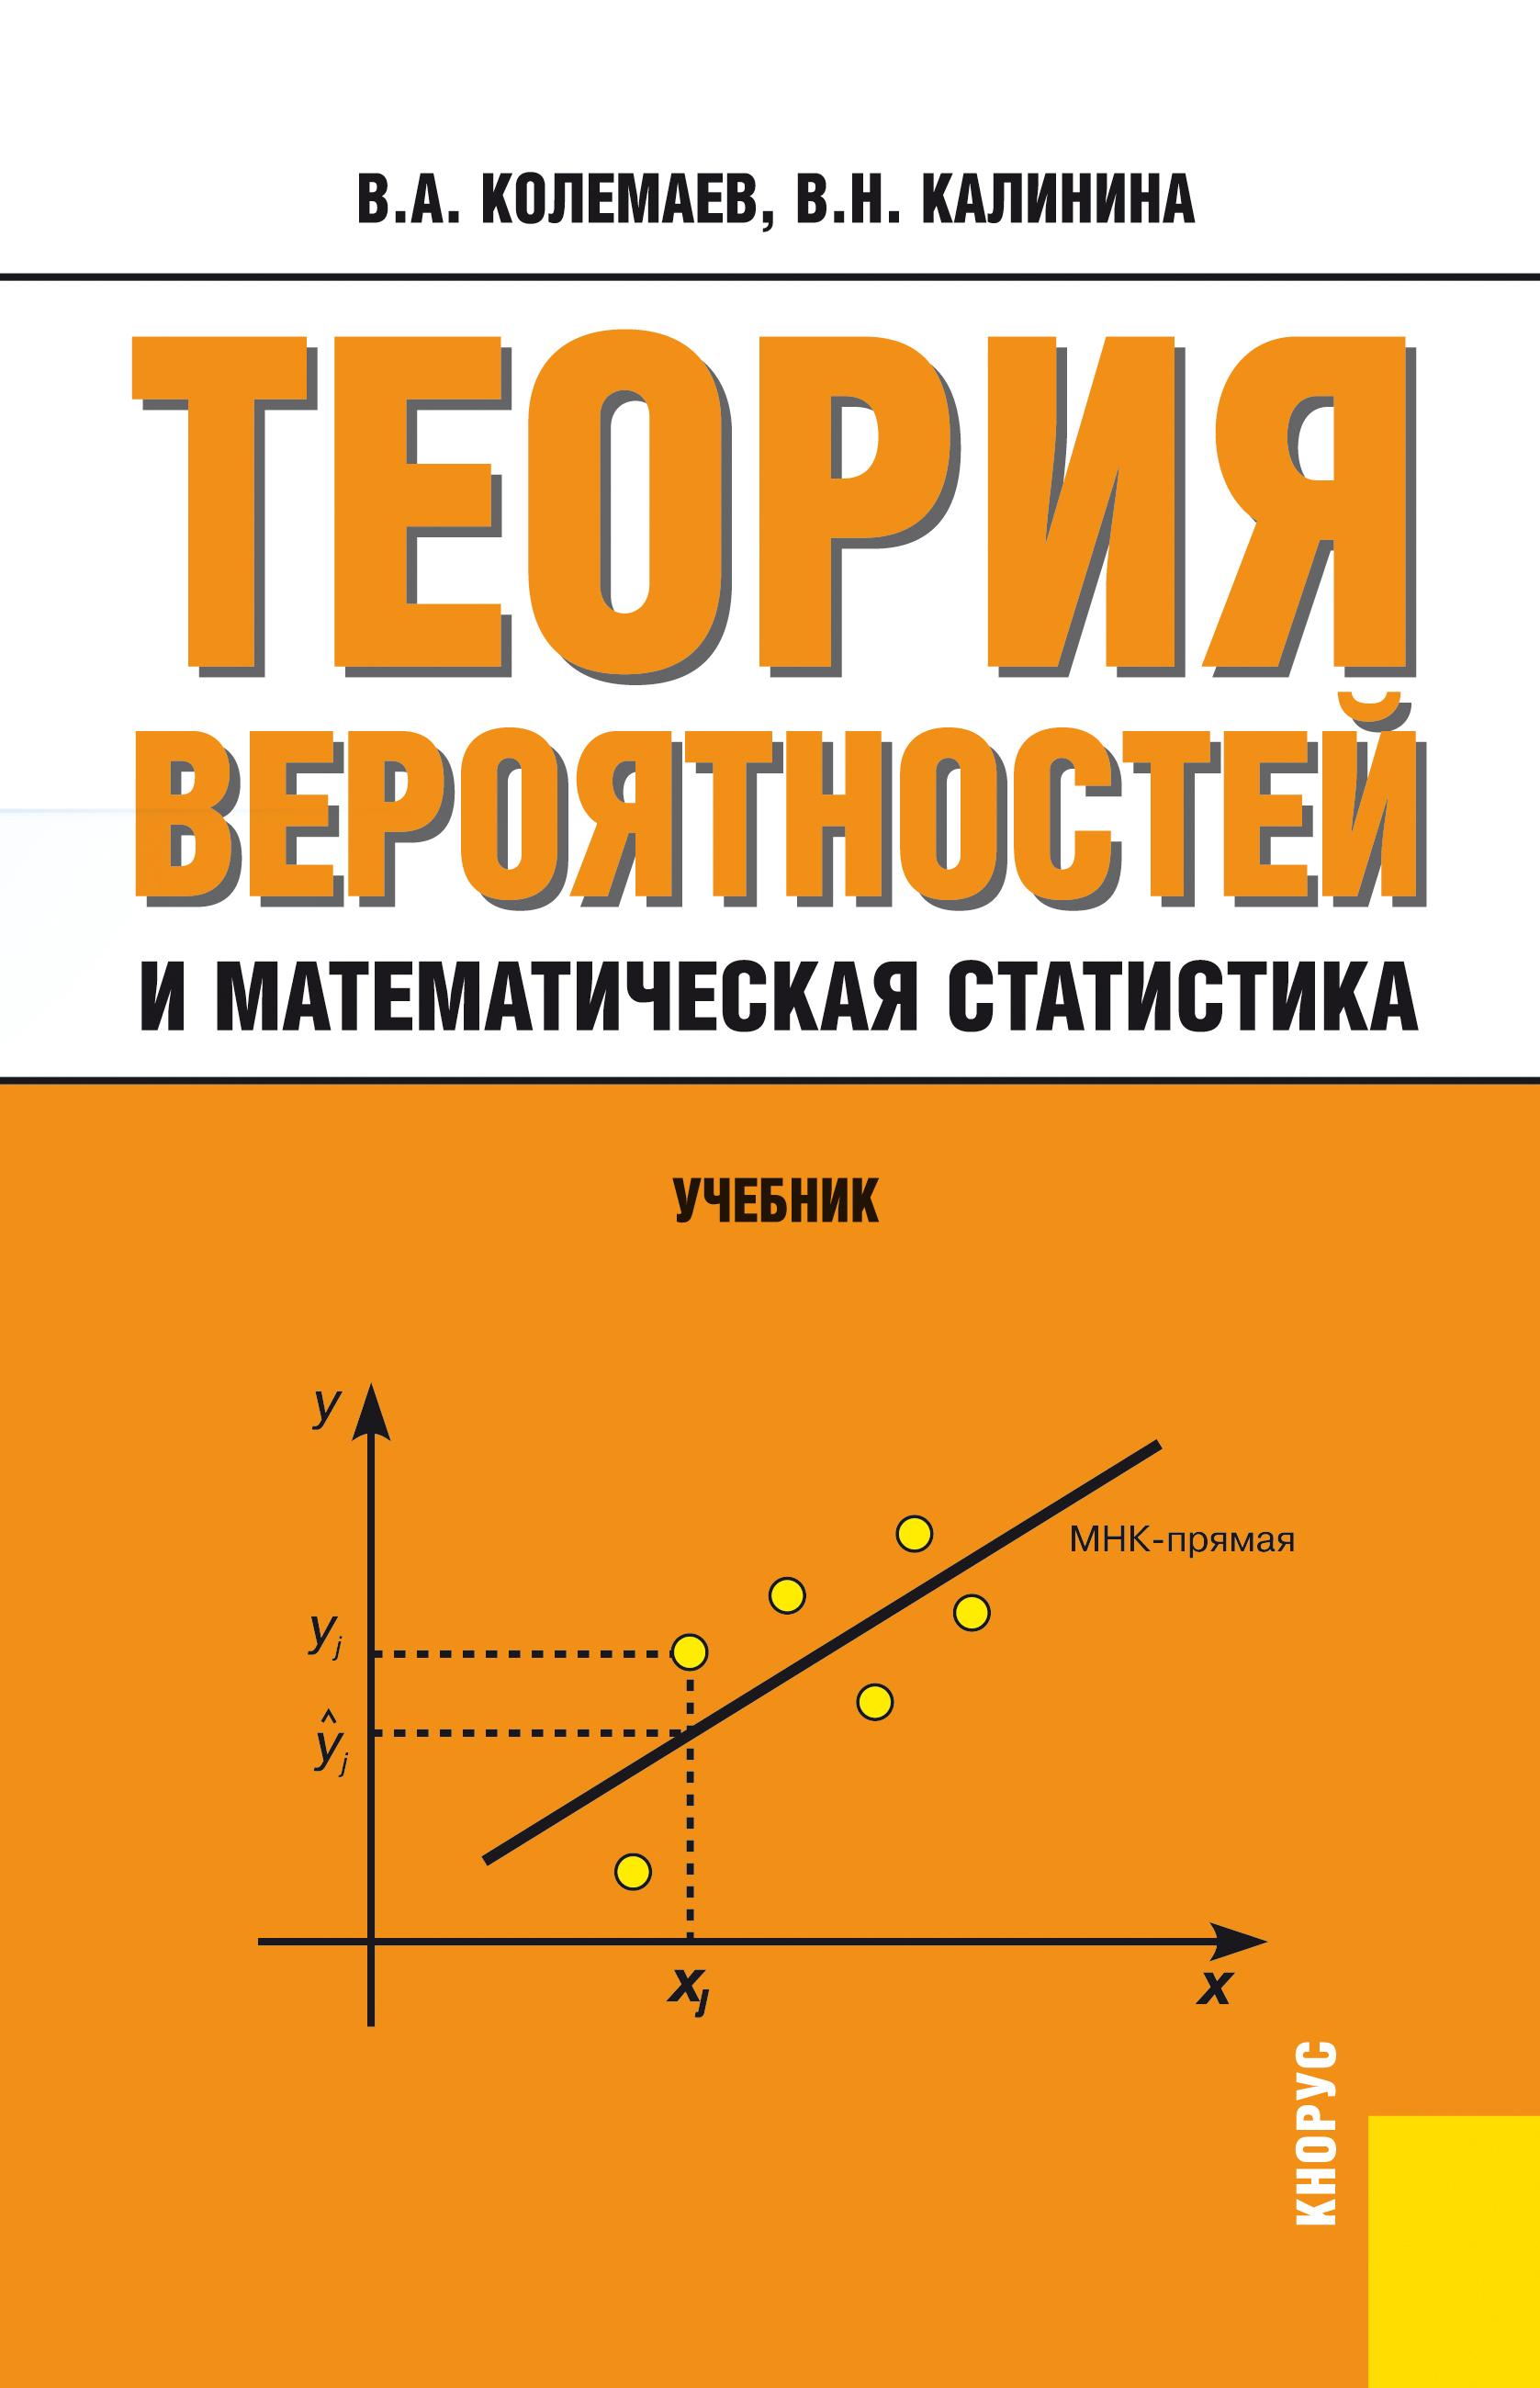 Вера Калинина Теория вероятностей и математическая статистика е р горяинова теория вероятностей и математическая статистика базовый курс с примерами и задачами